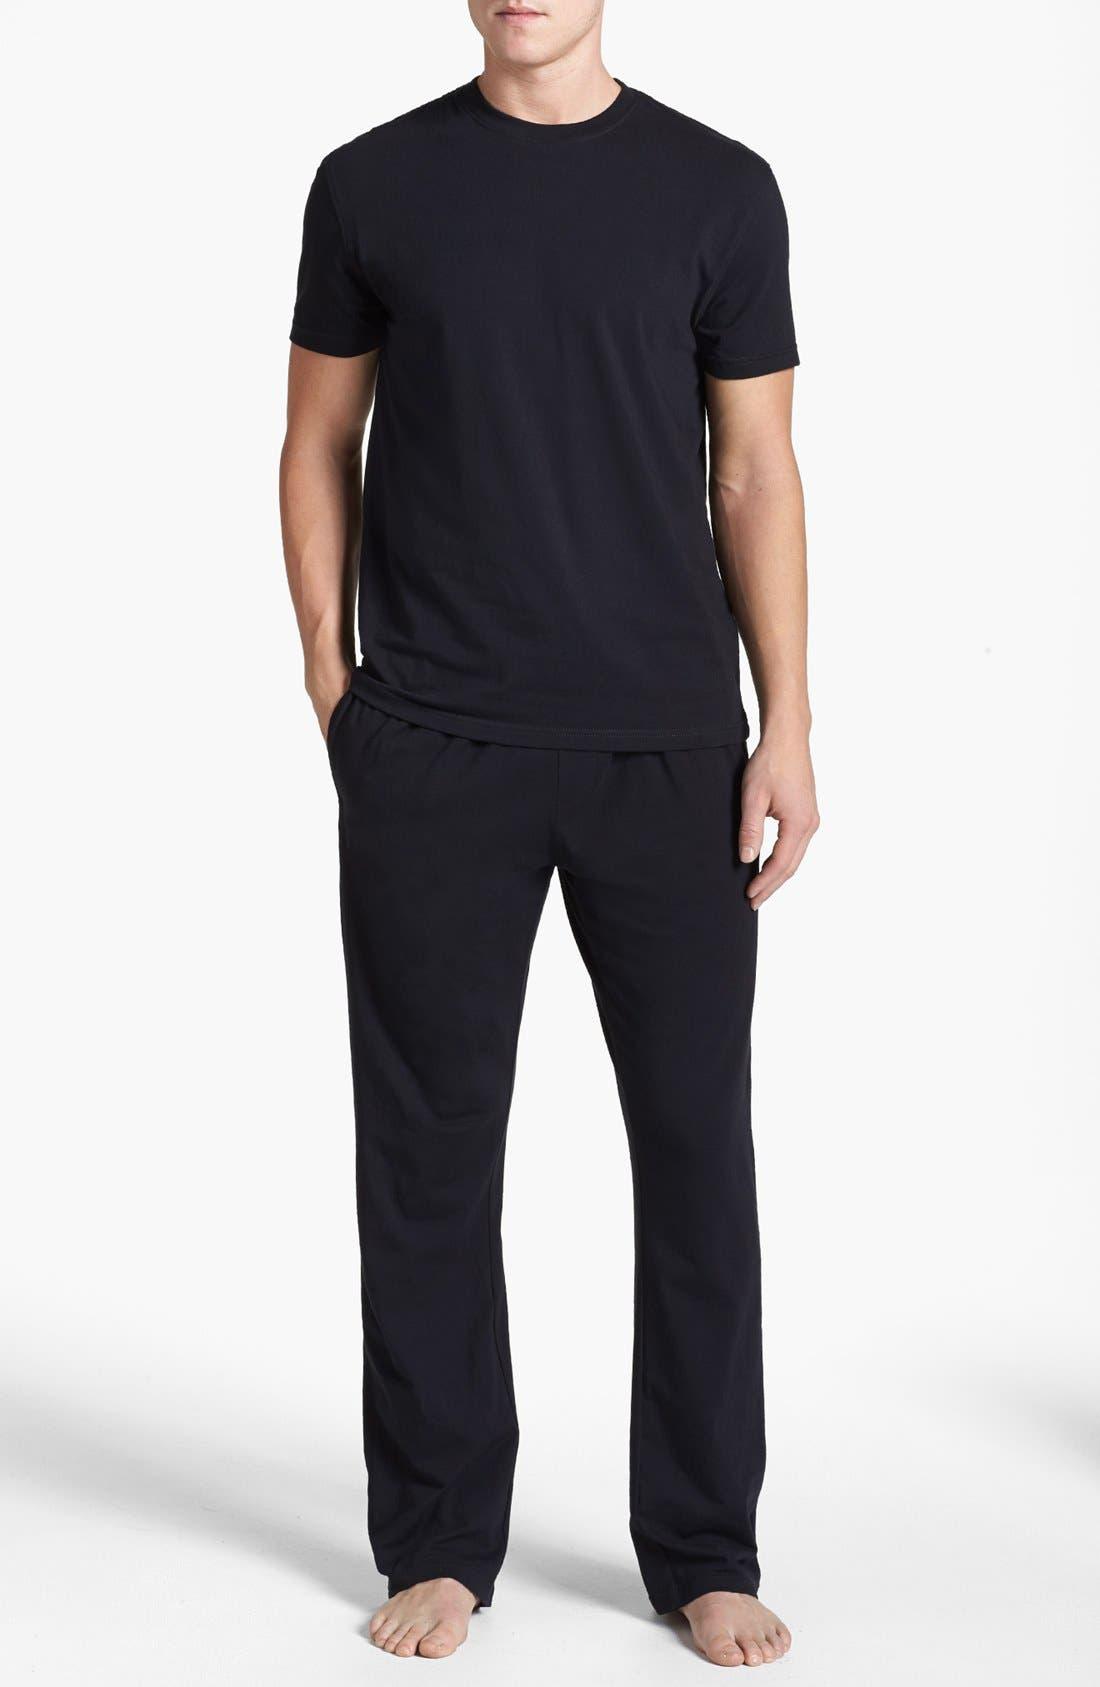 Alternate Image 1 Selected - Nordstrom Stretch Cotton Pajama Set